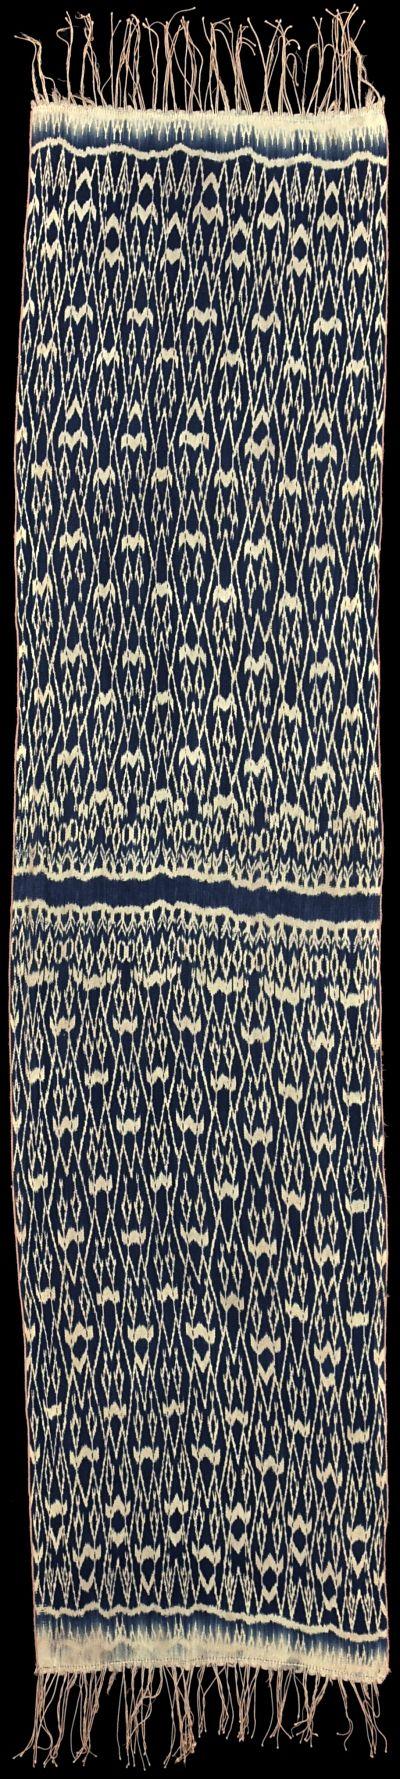 Ikat from Timor-Barat, Timor, Indonesia, 1930 - 1940.